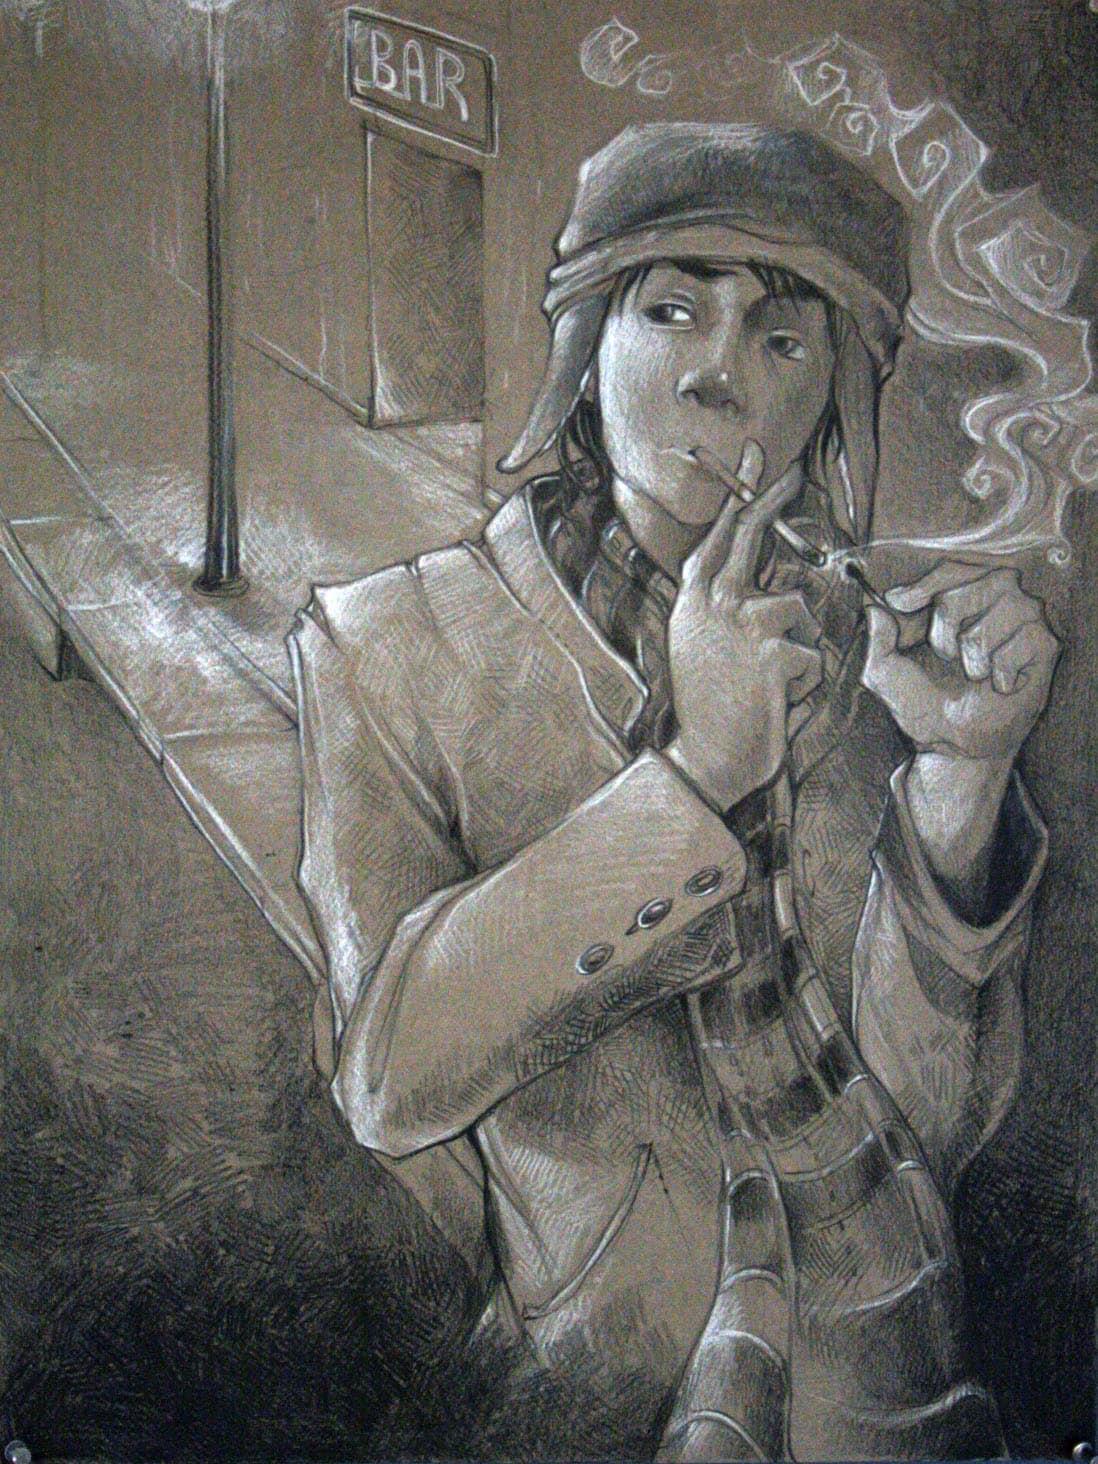 The Catcher in the Rye: Holden Caulfield Analysis - SchoolWorkHelper